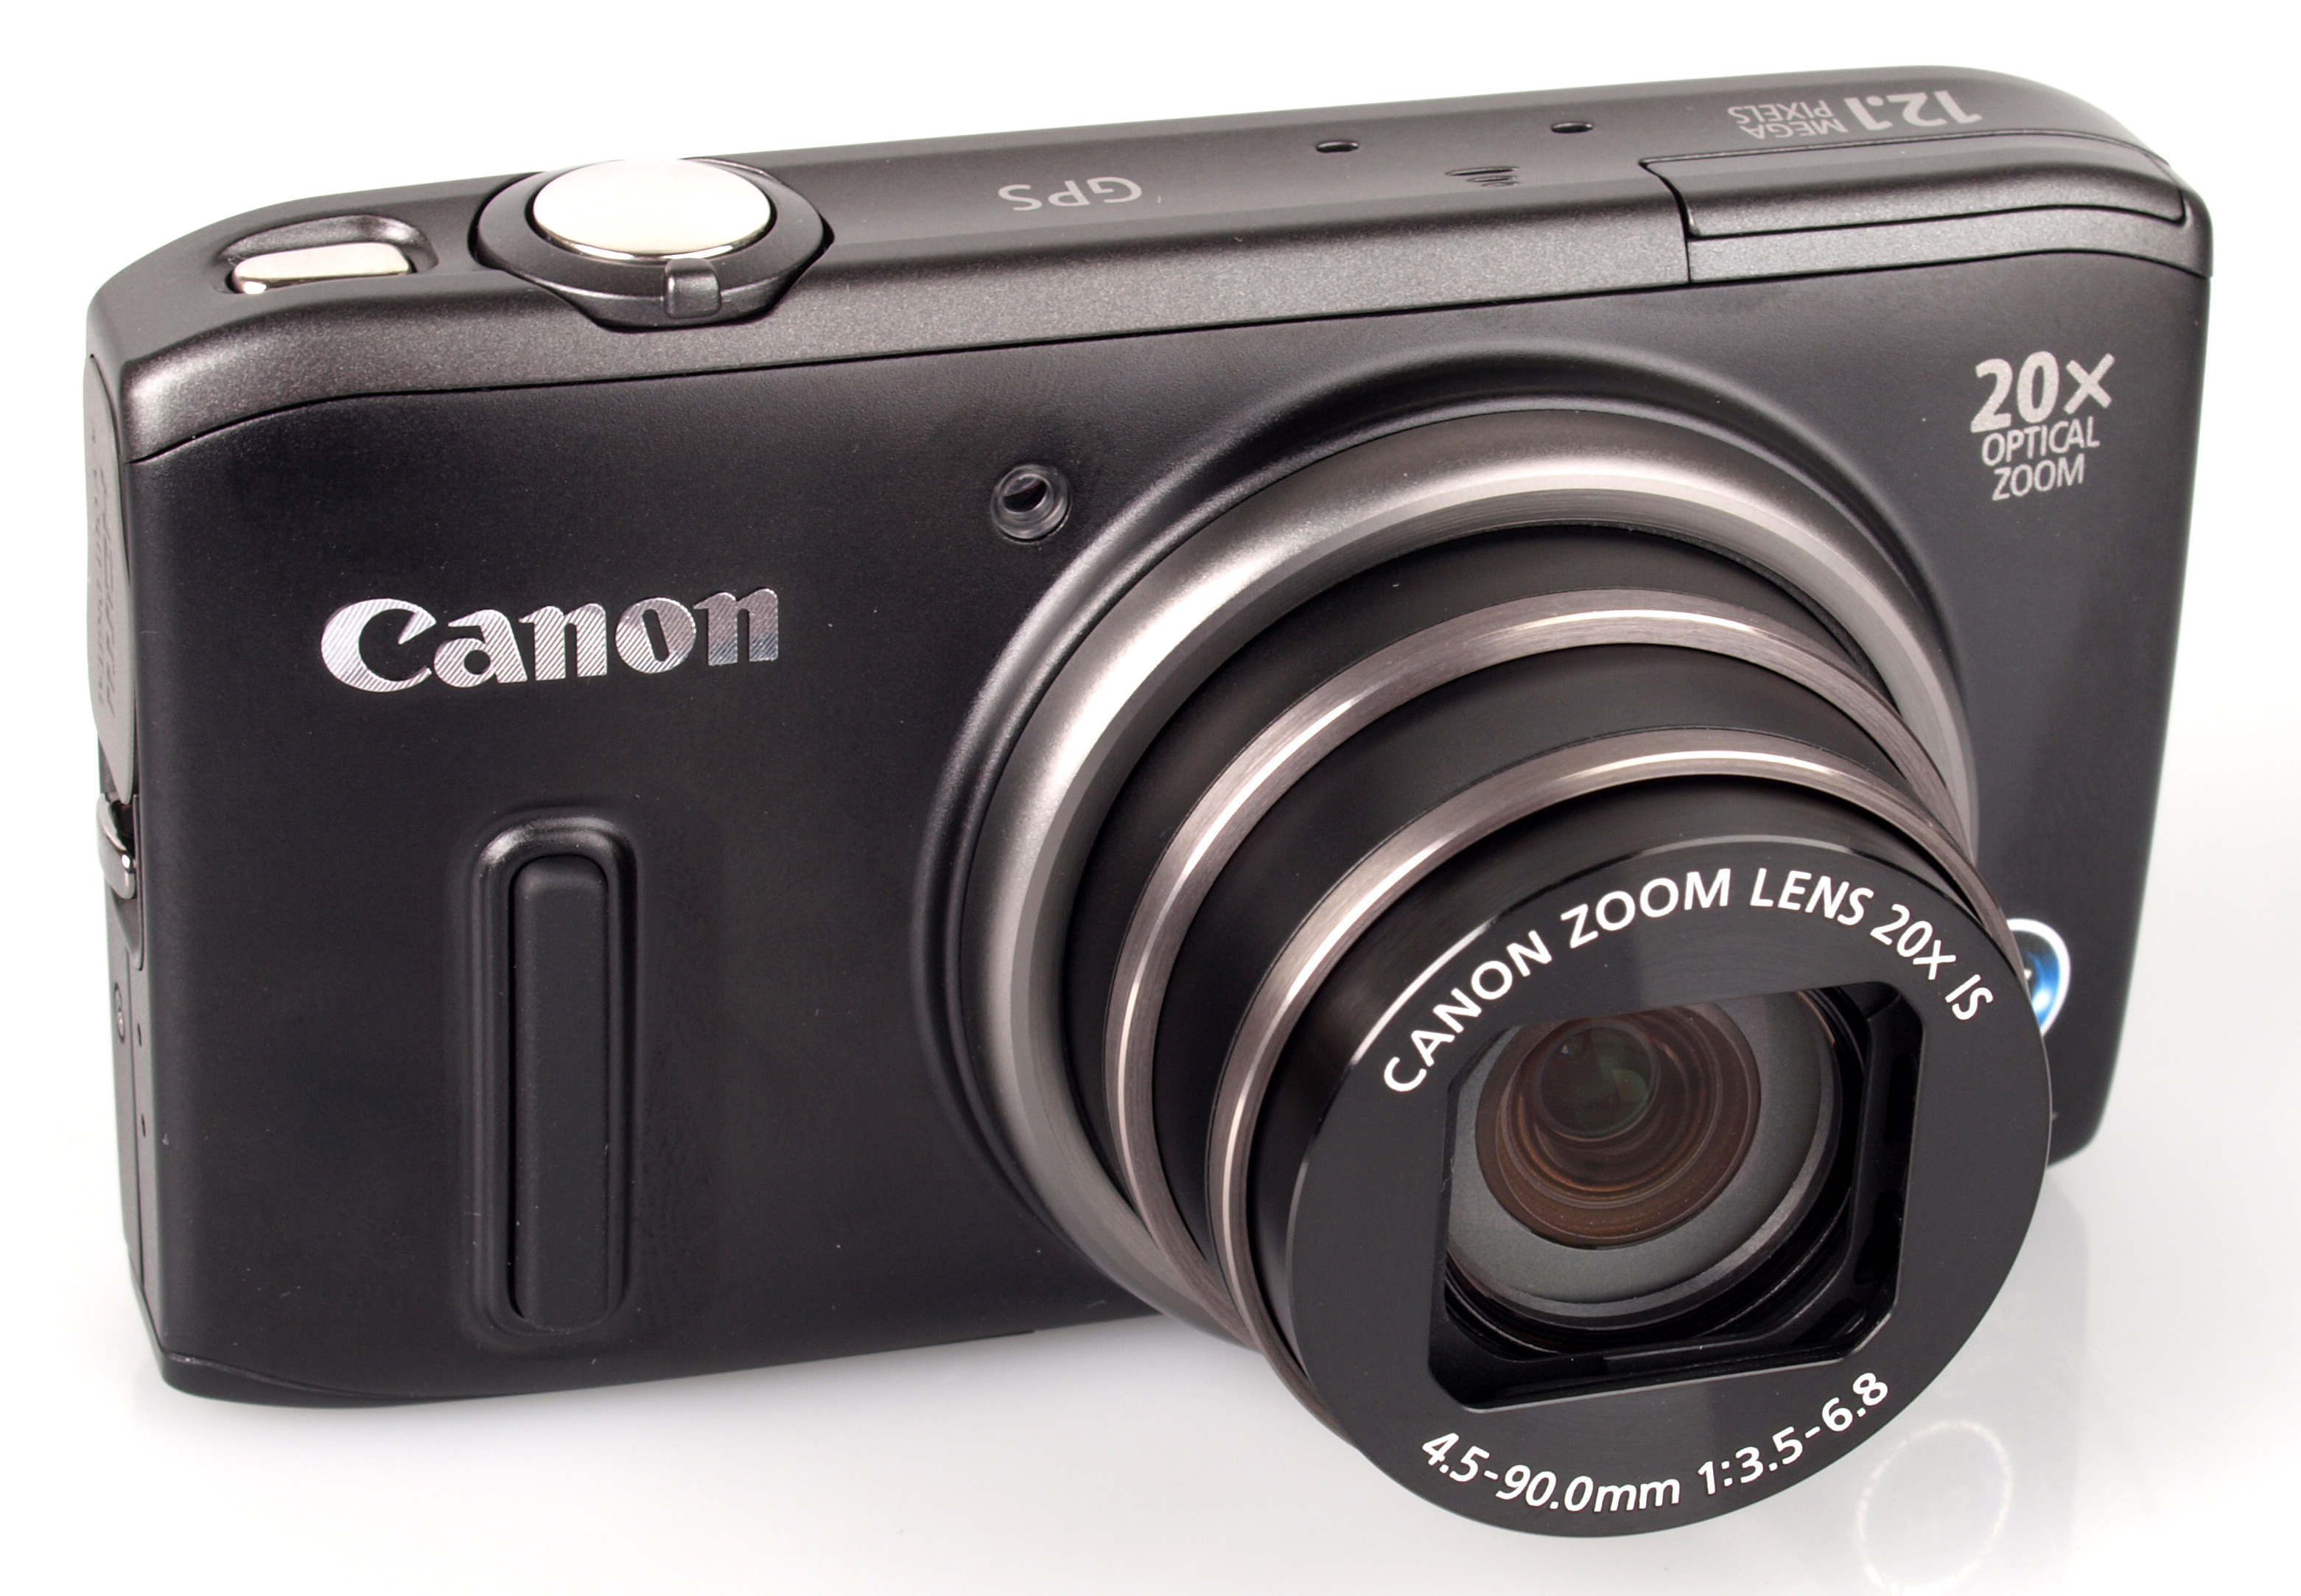 canon powershot sx260 hs gps pocket zoom review rh ephotozine com canon powershot sx260 hs manual canon powershot sx260 hs troubleshooting